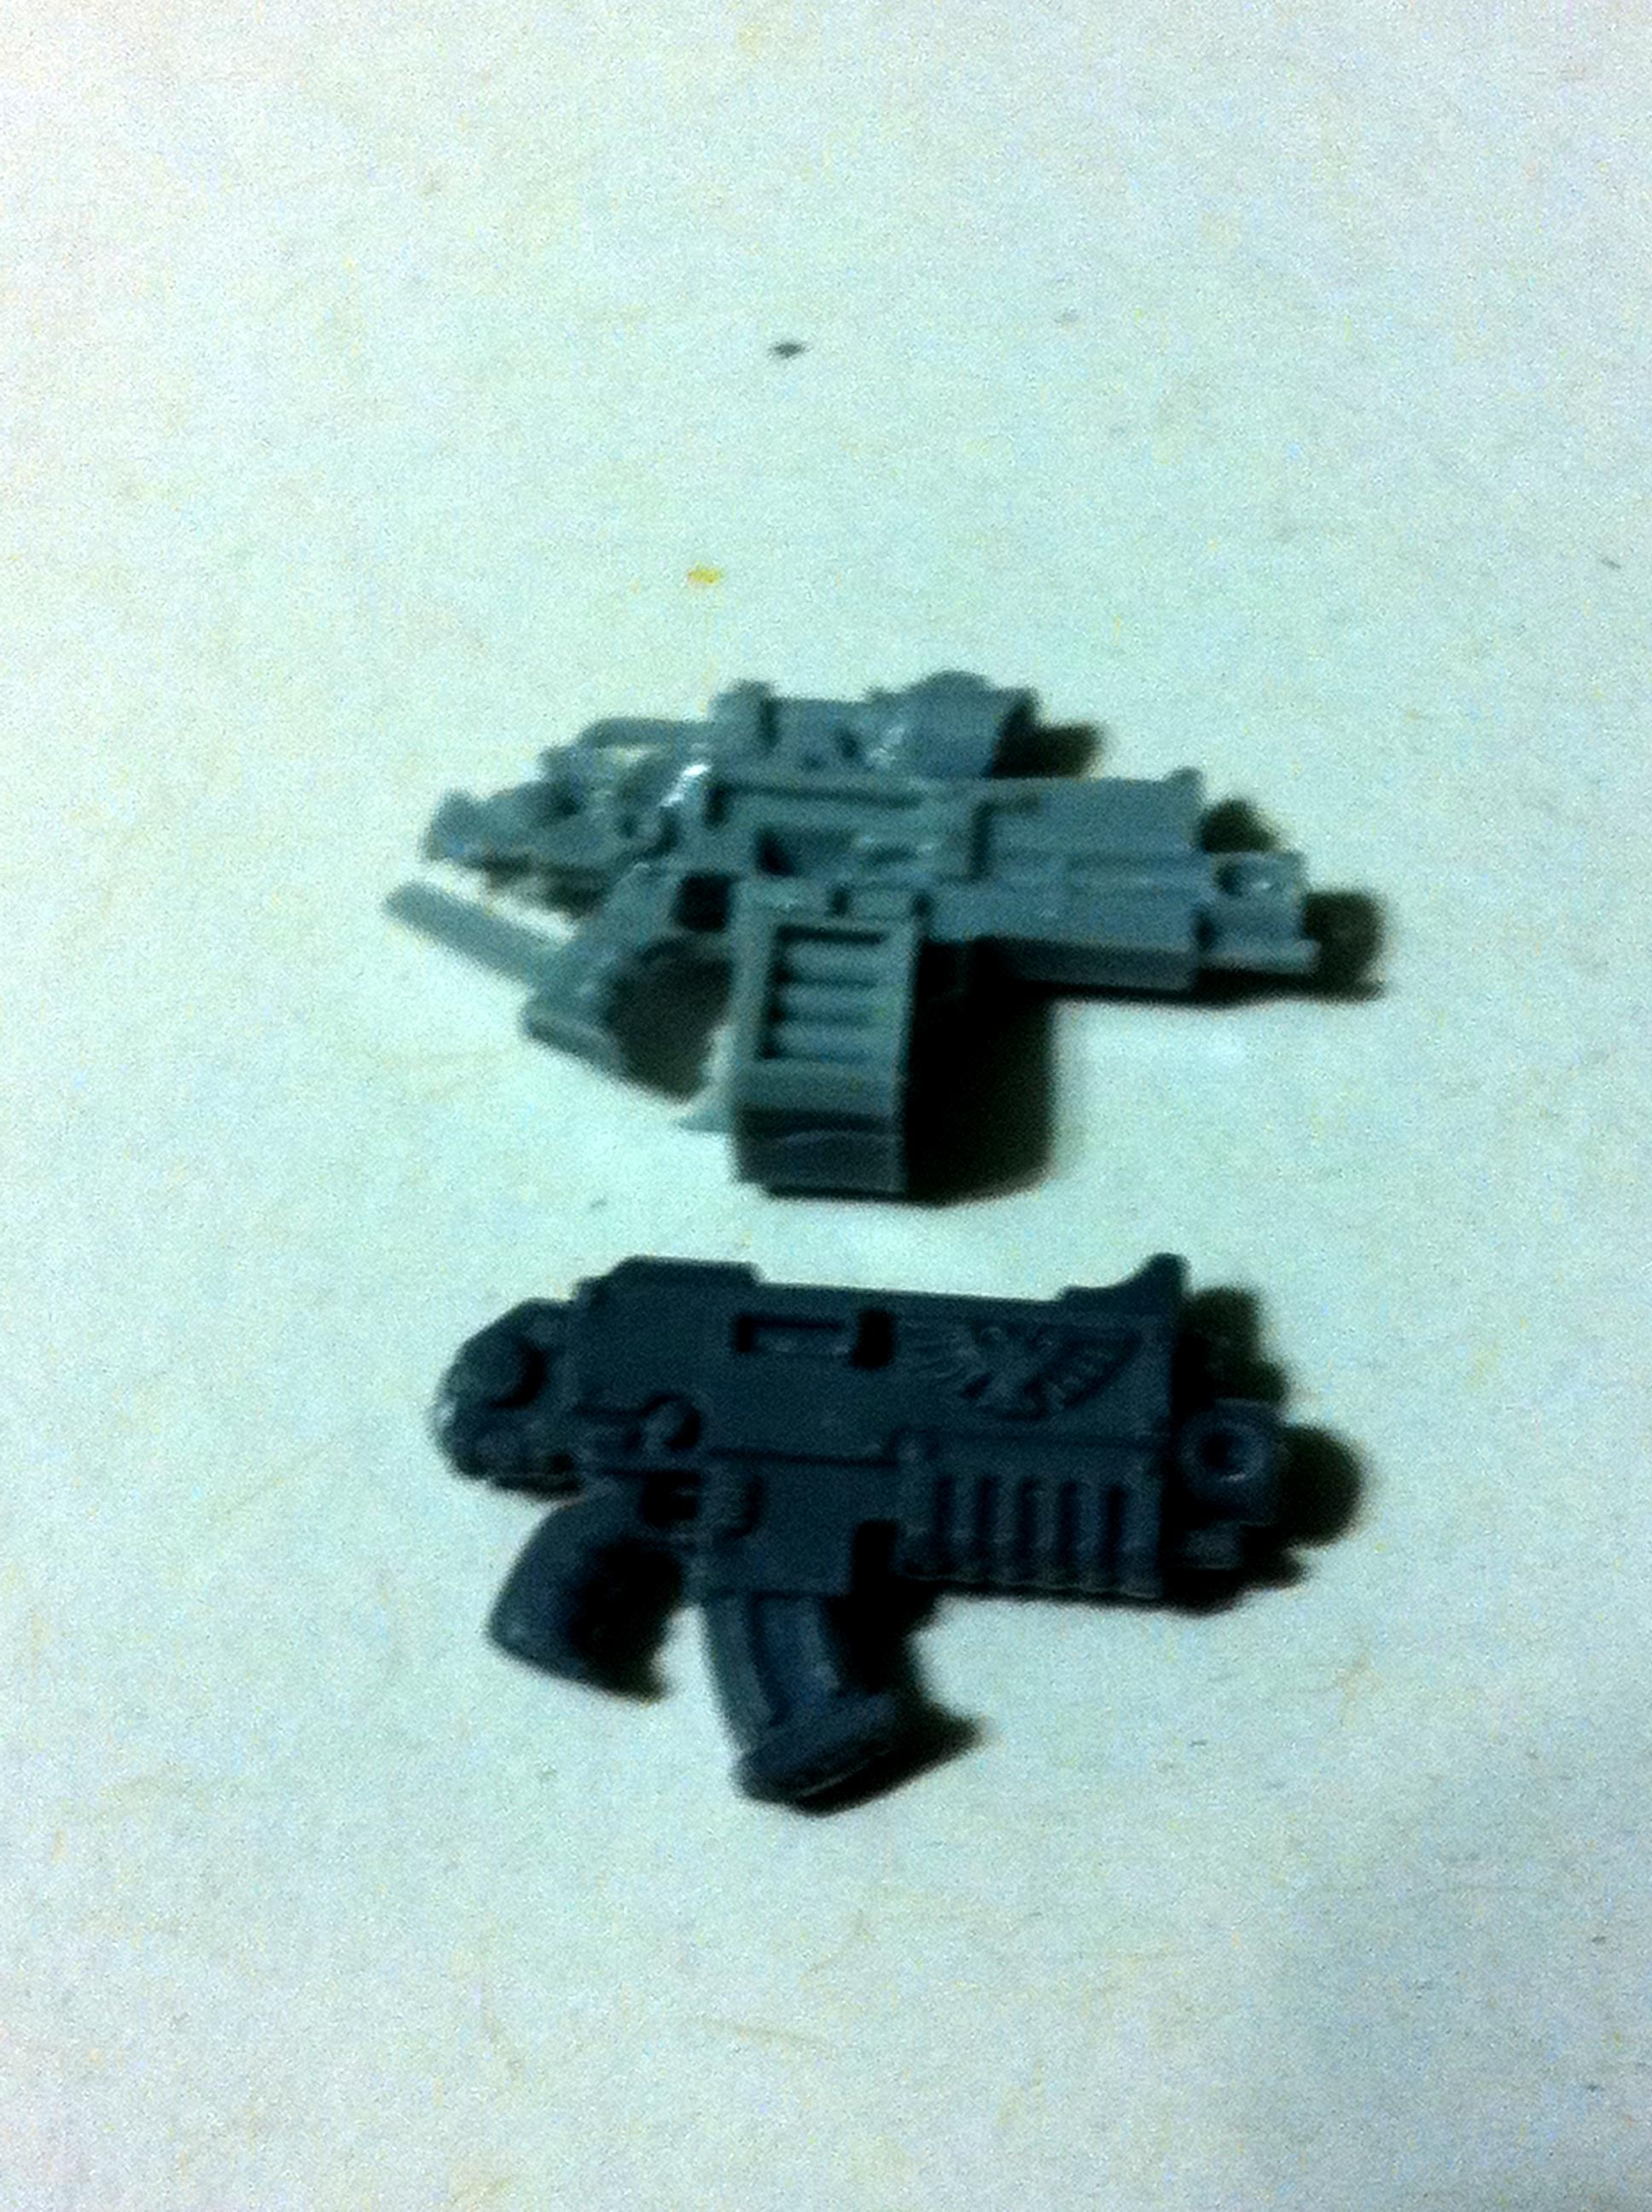 umbra ferrox /standard bolter comparison